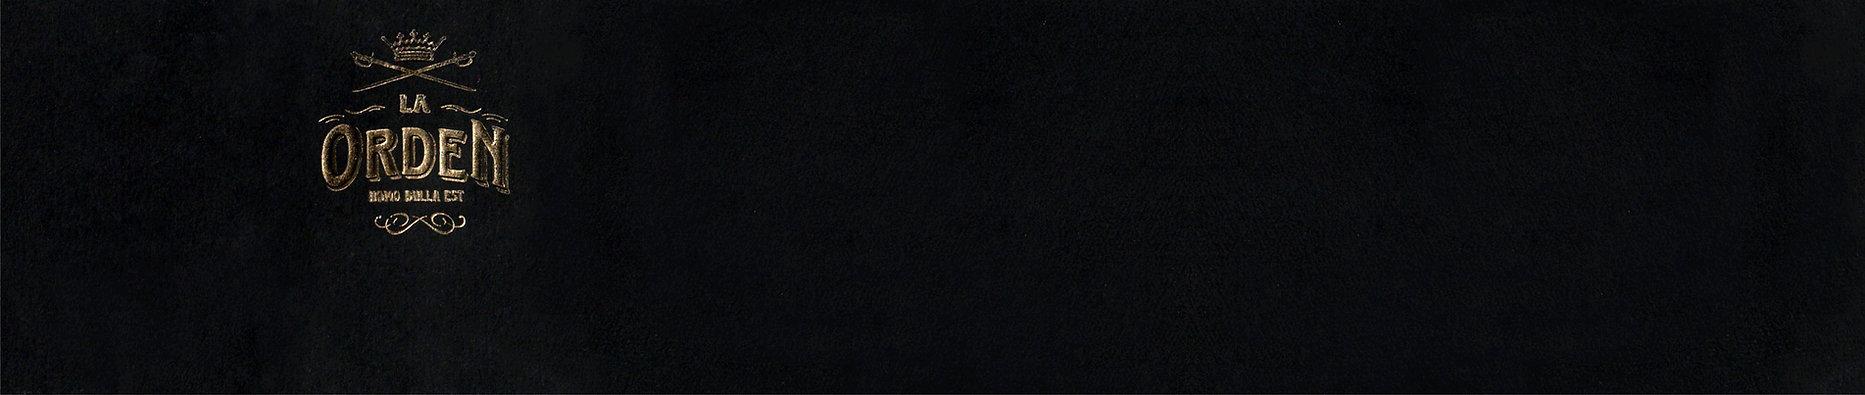 fondo negro orden1.jpg